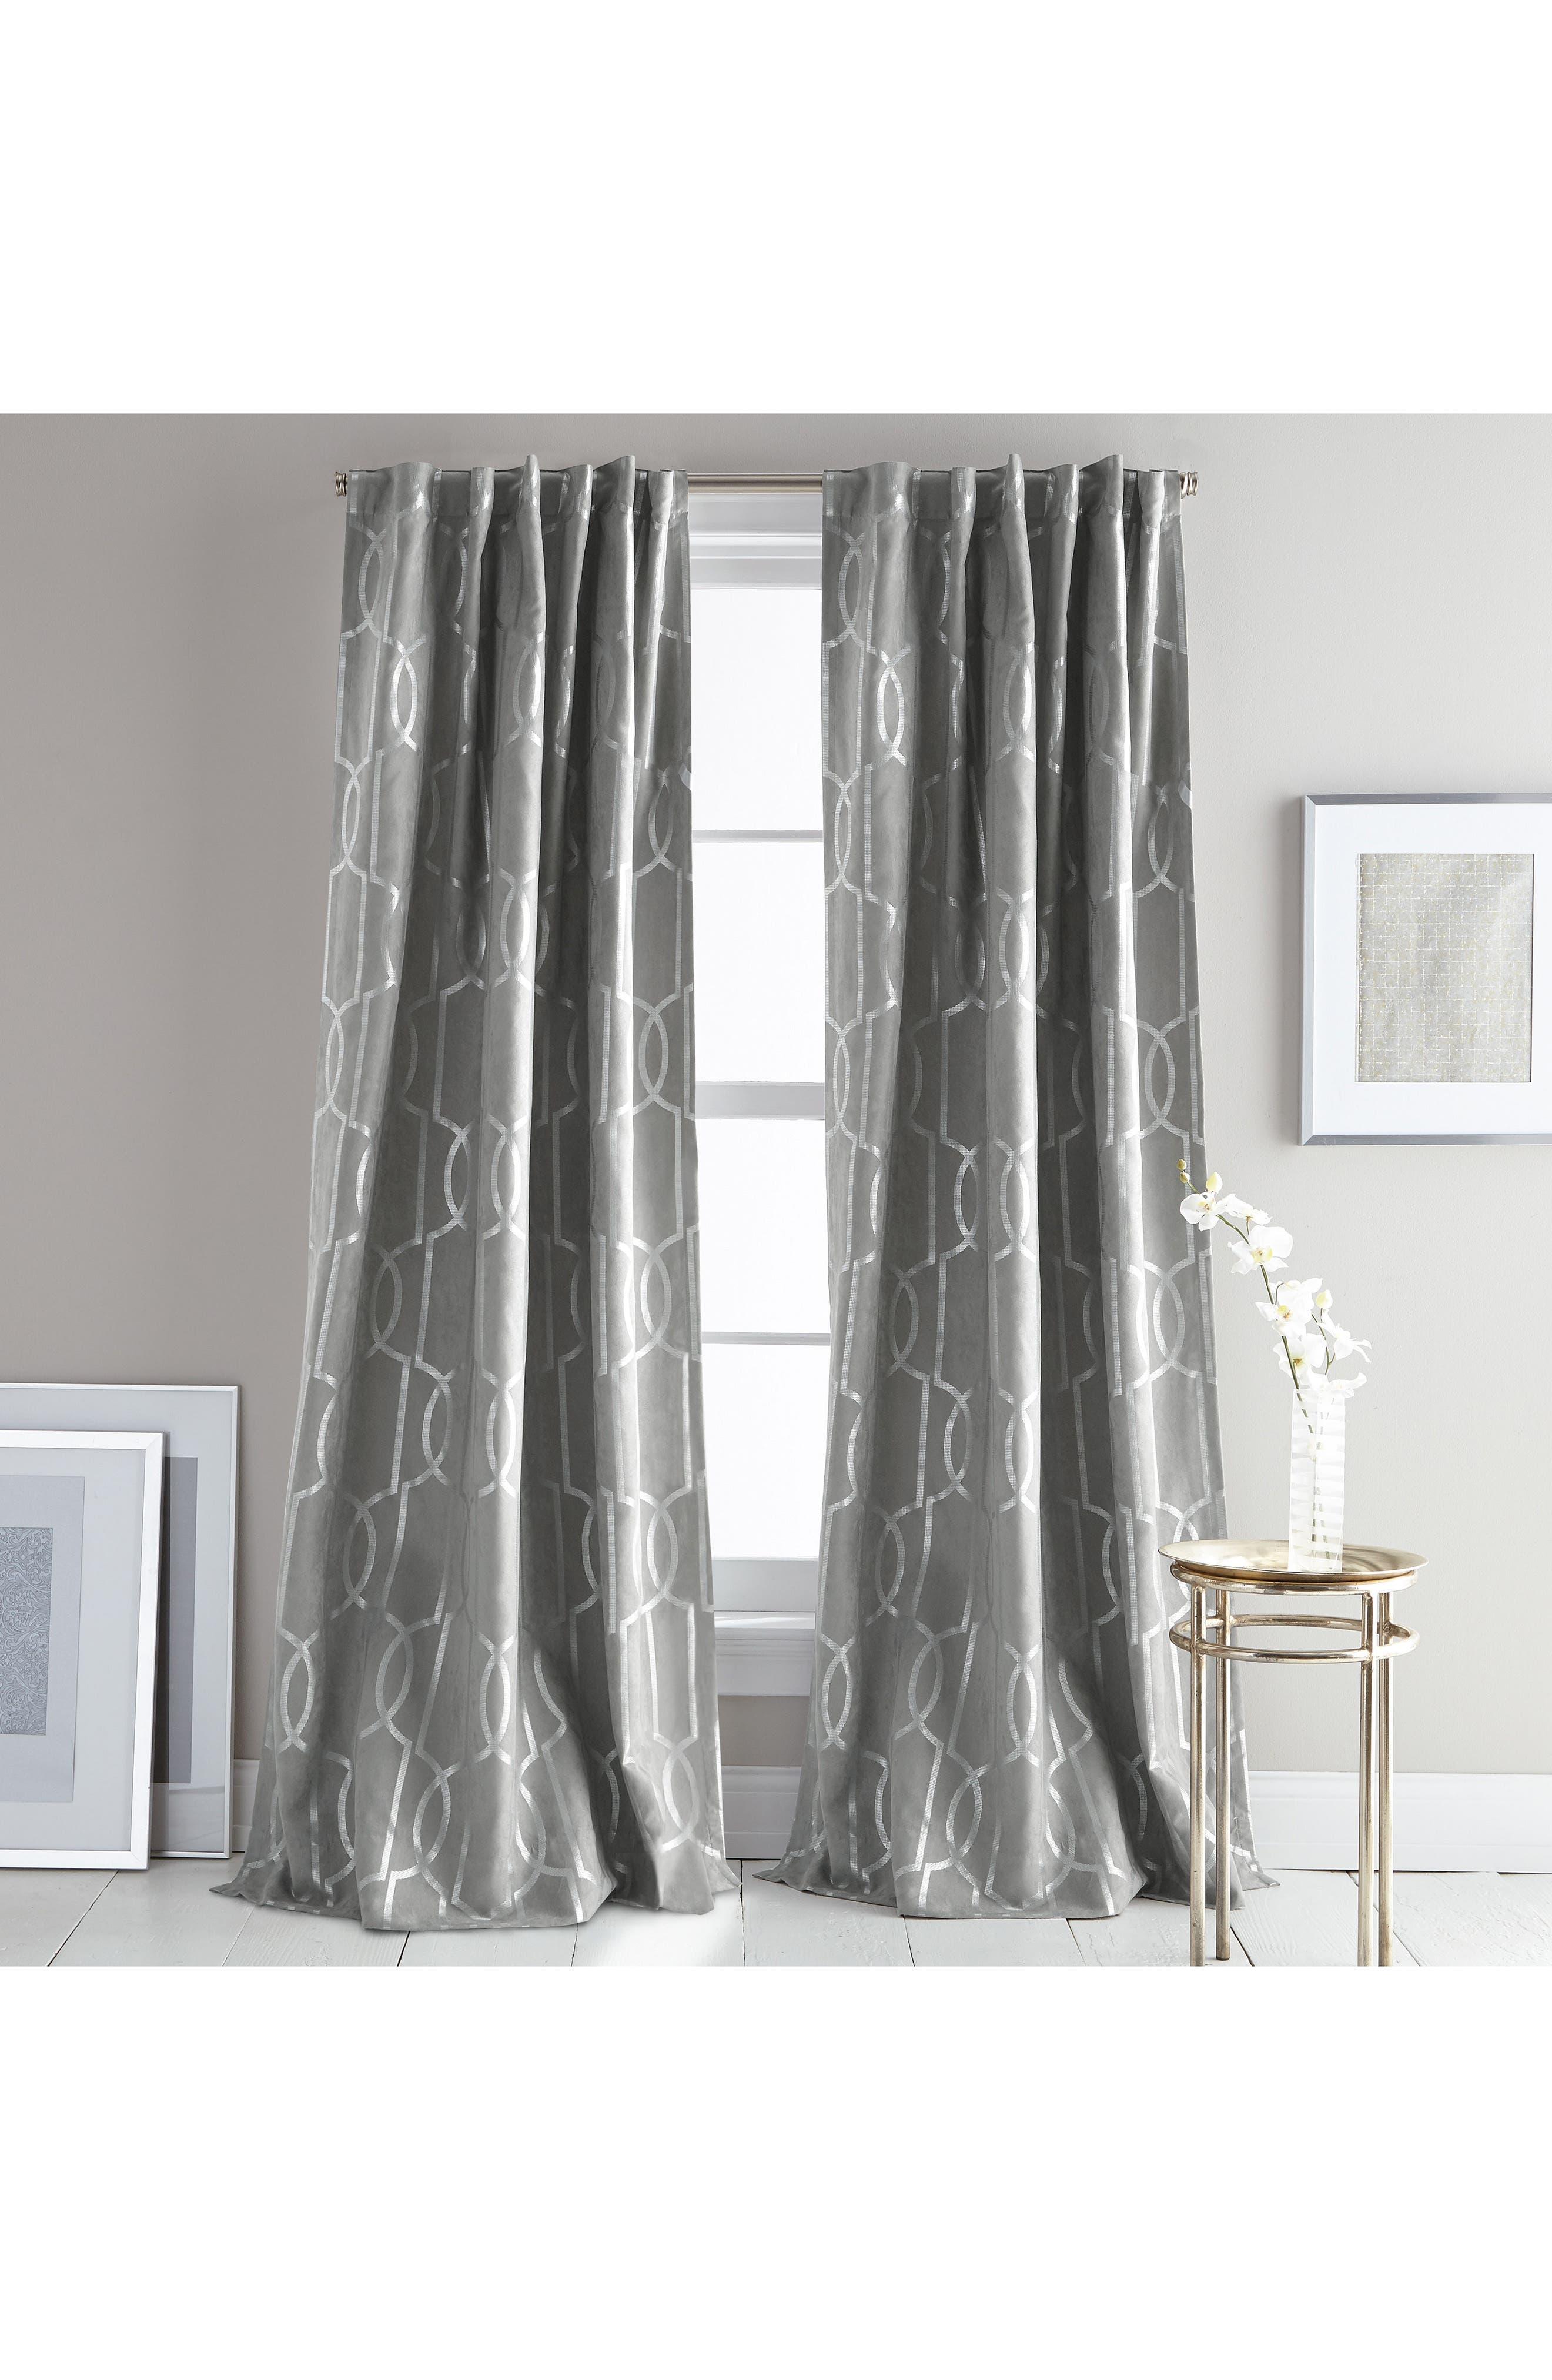 Atrium Set of 2 Window Panels,                             Main thumbnail 1, color,                             Grey